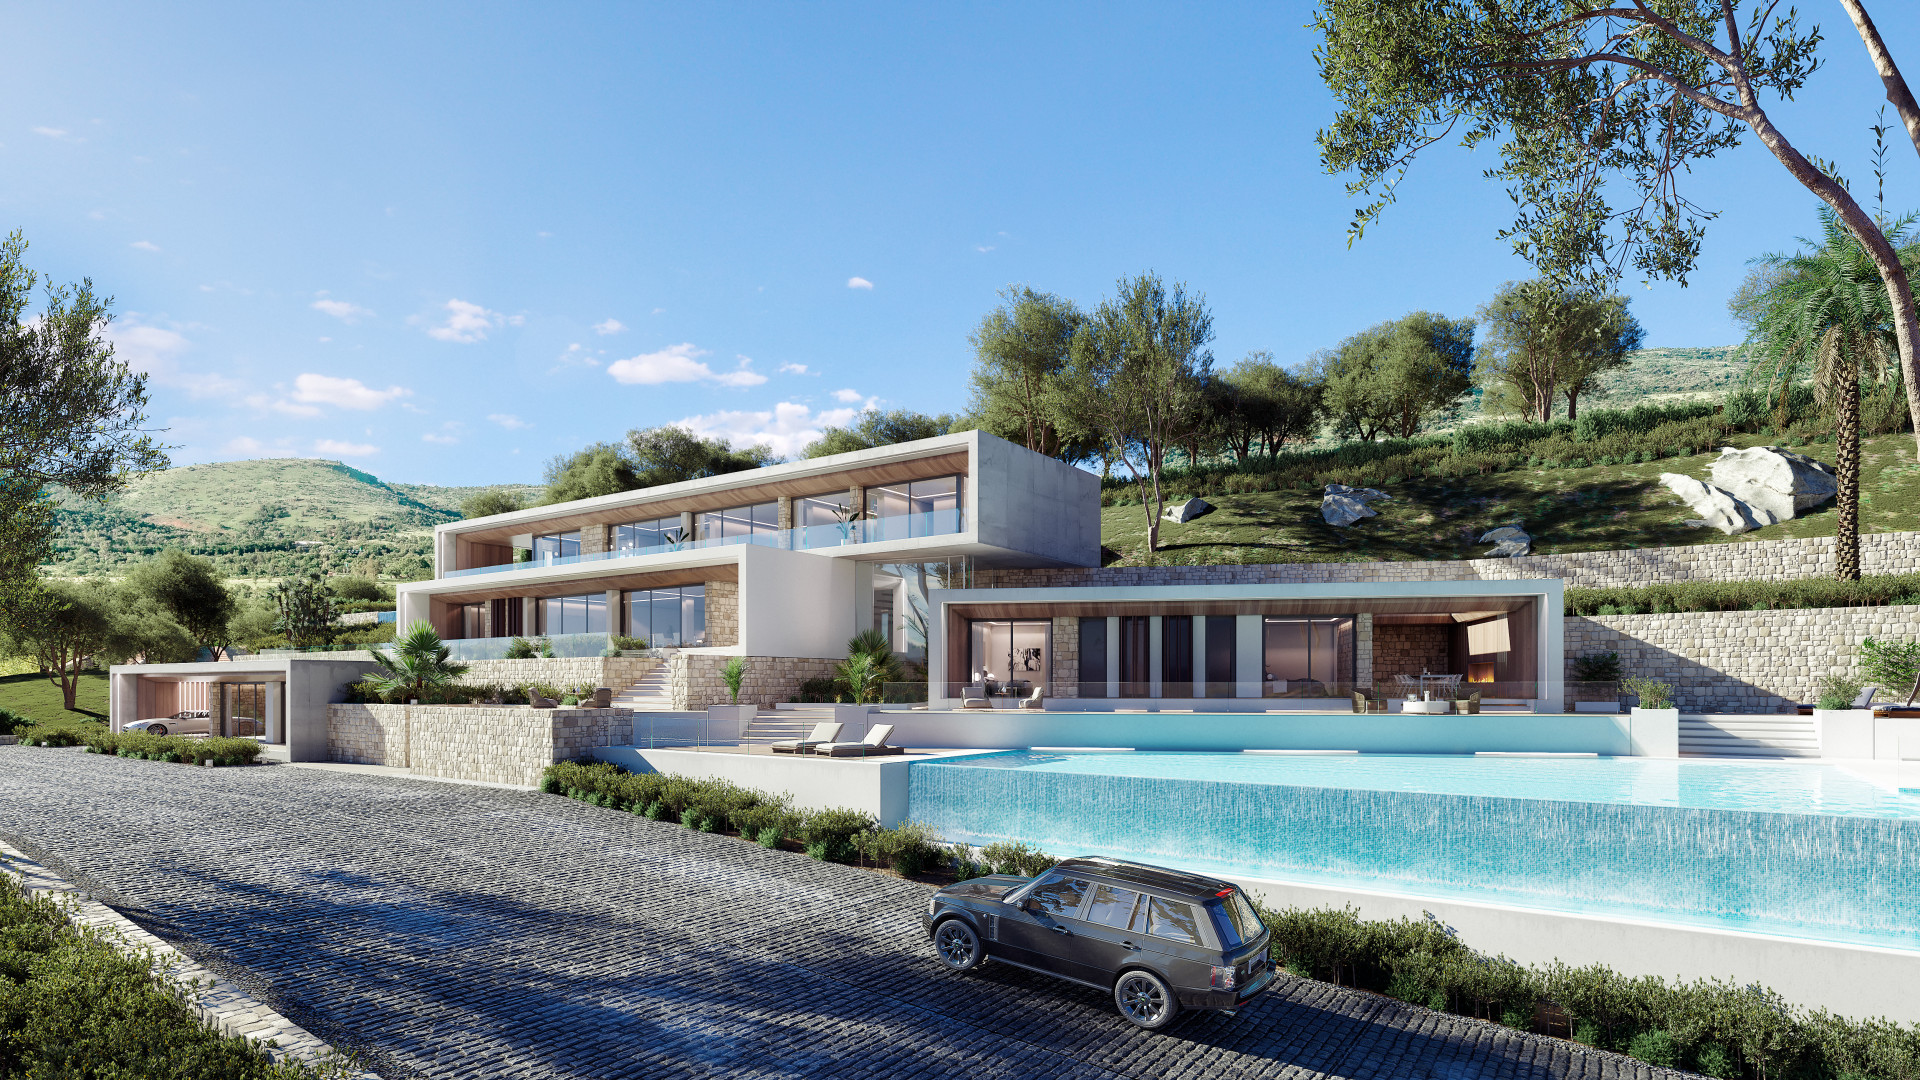 Taylor made turnkey project of brand new modern villas for sale in Benahavis, La Quinta